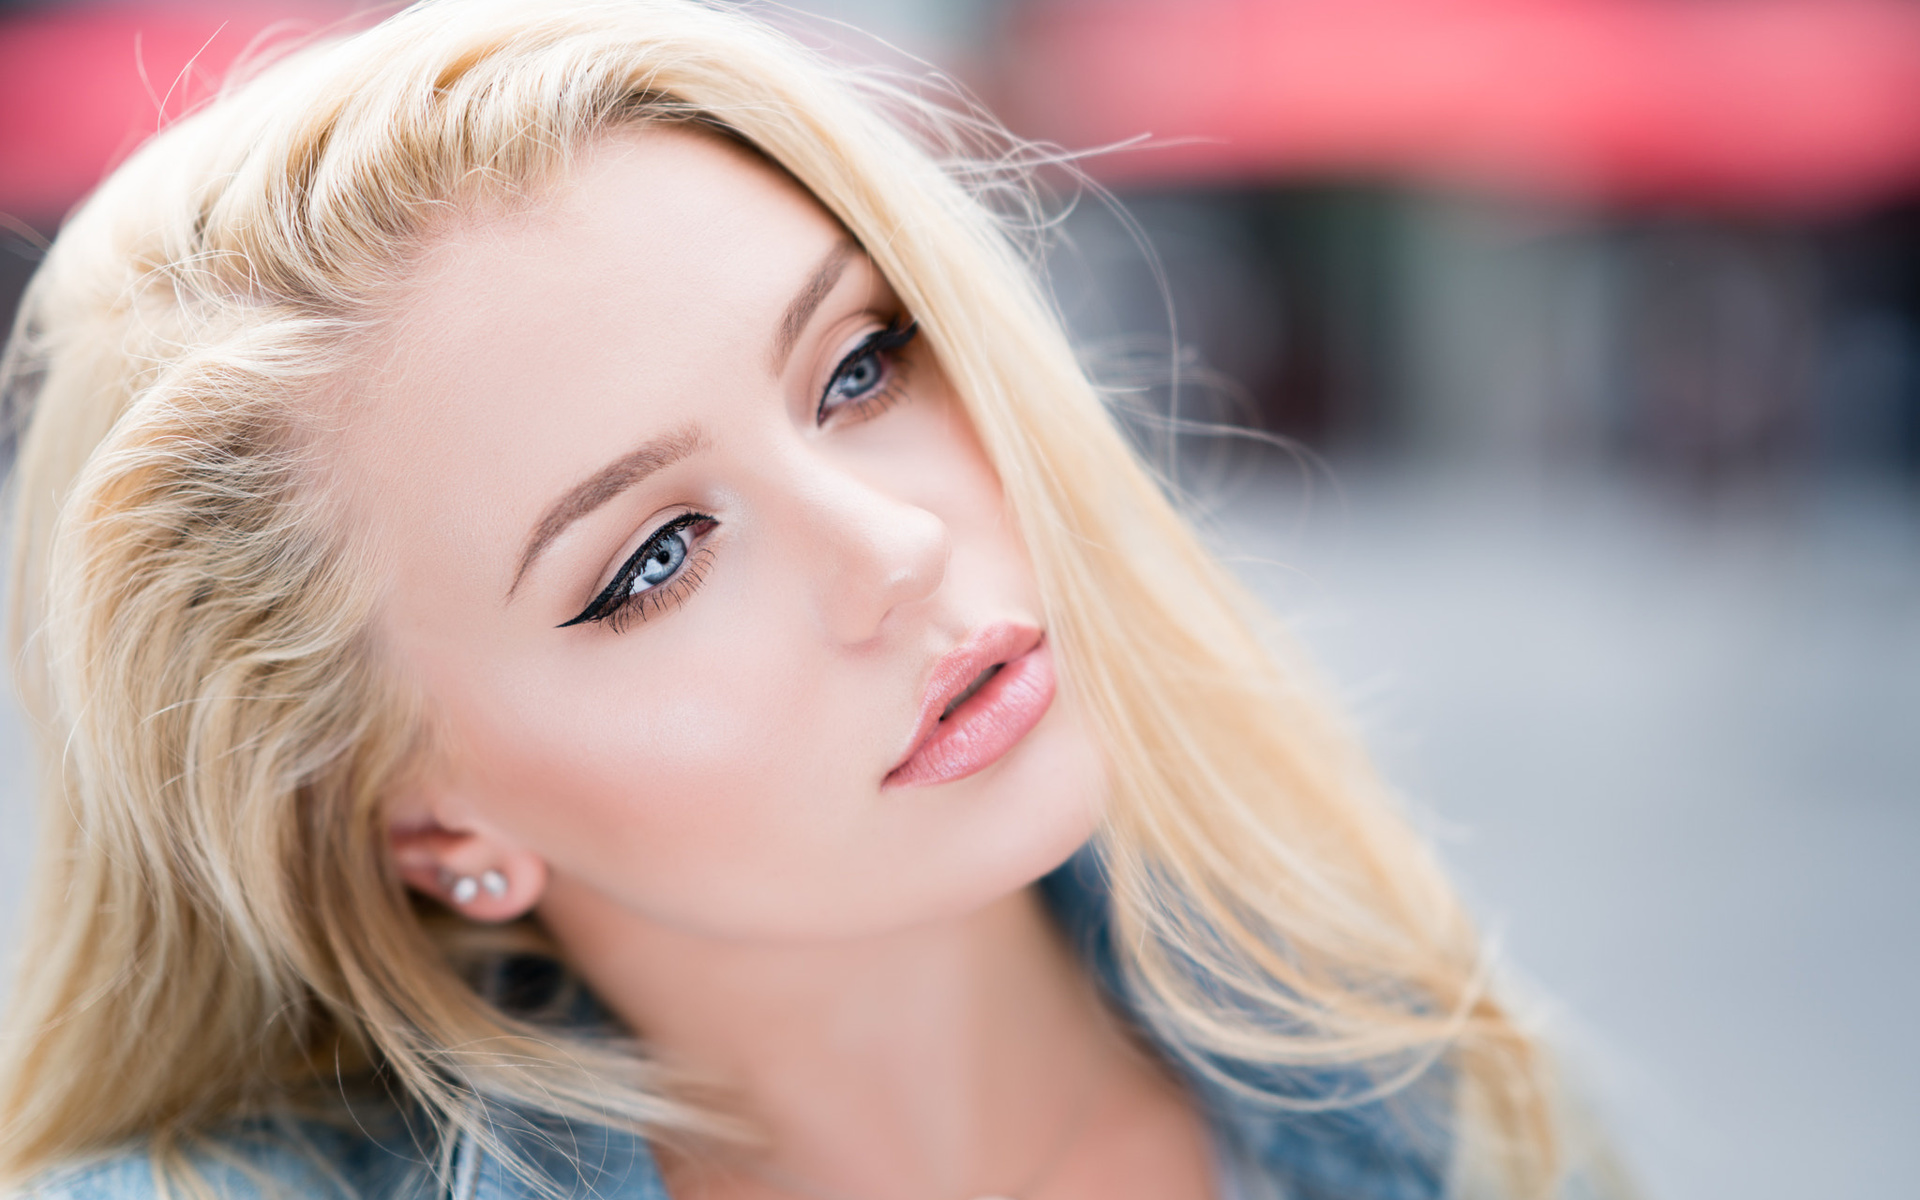 labia-big-women-blondes-viral-nude-boy